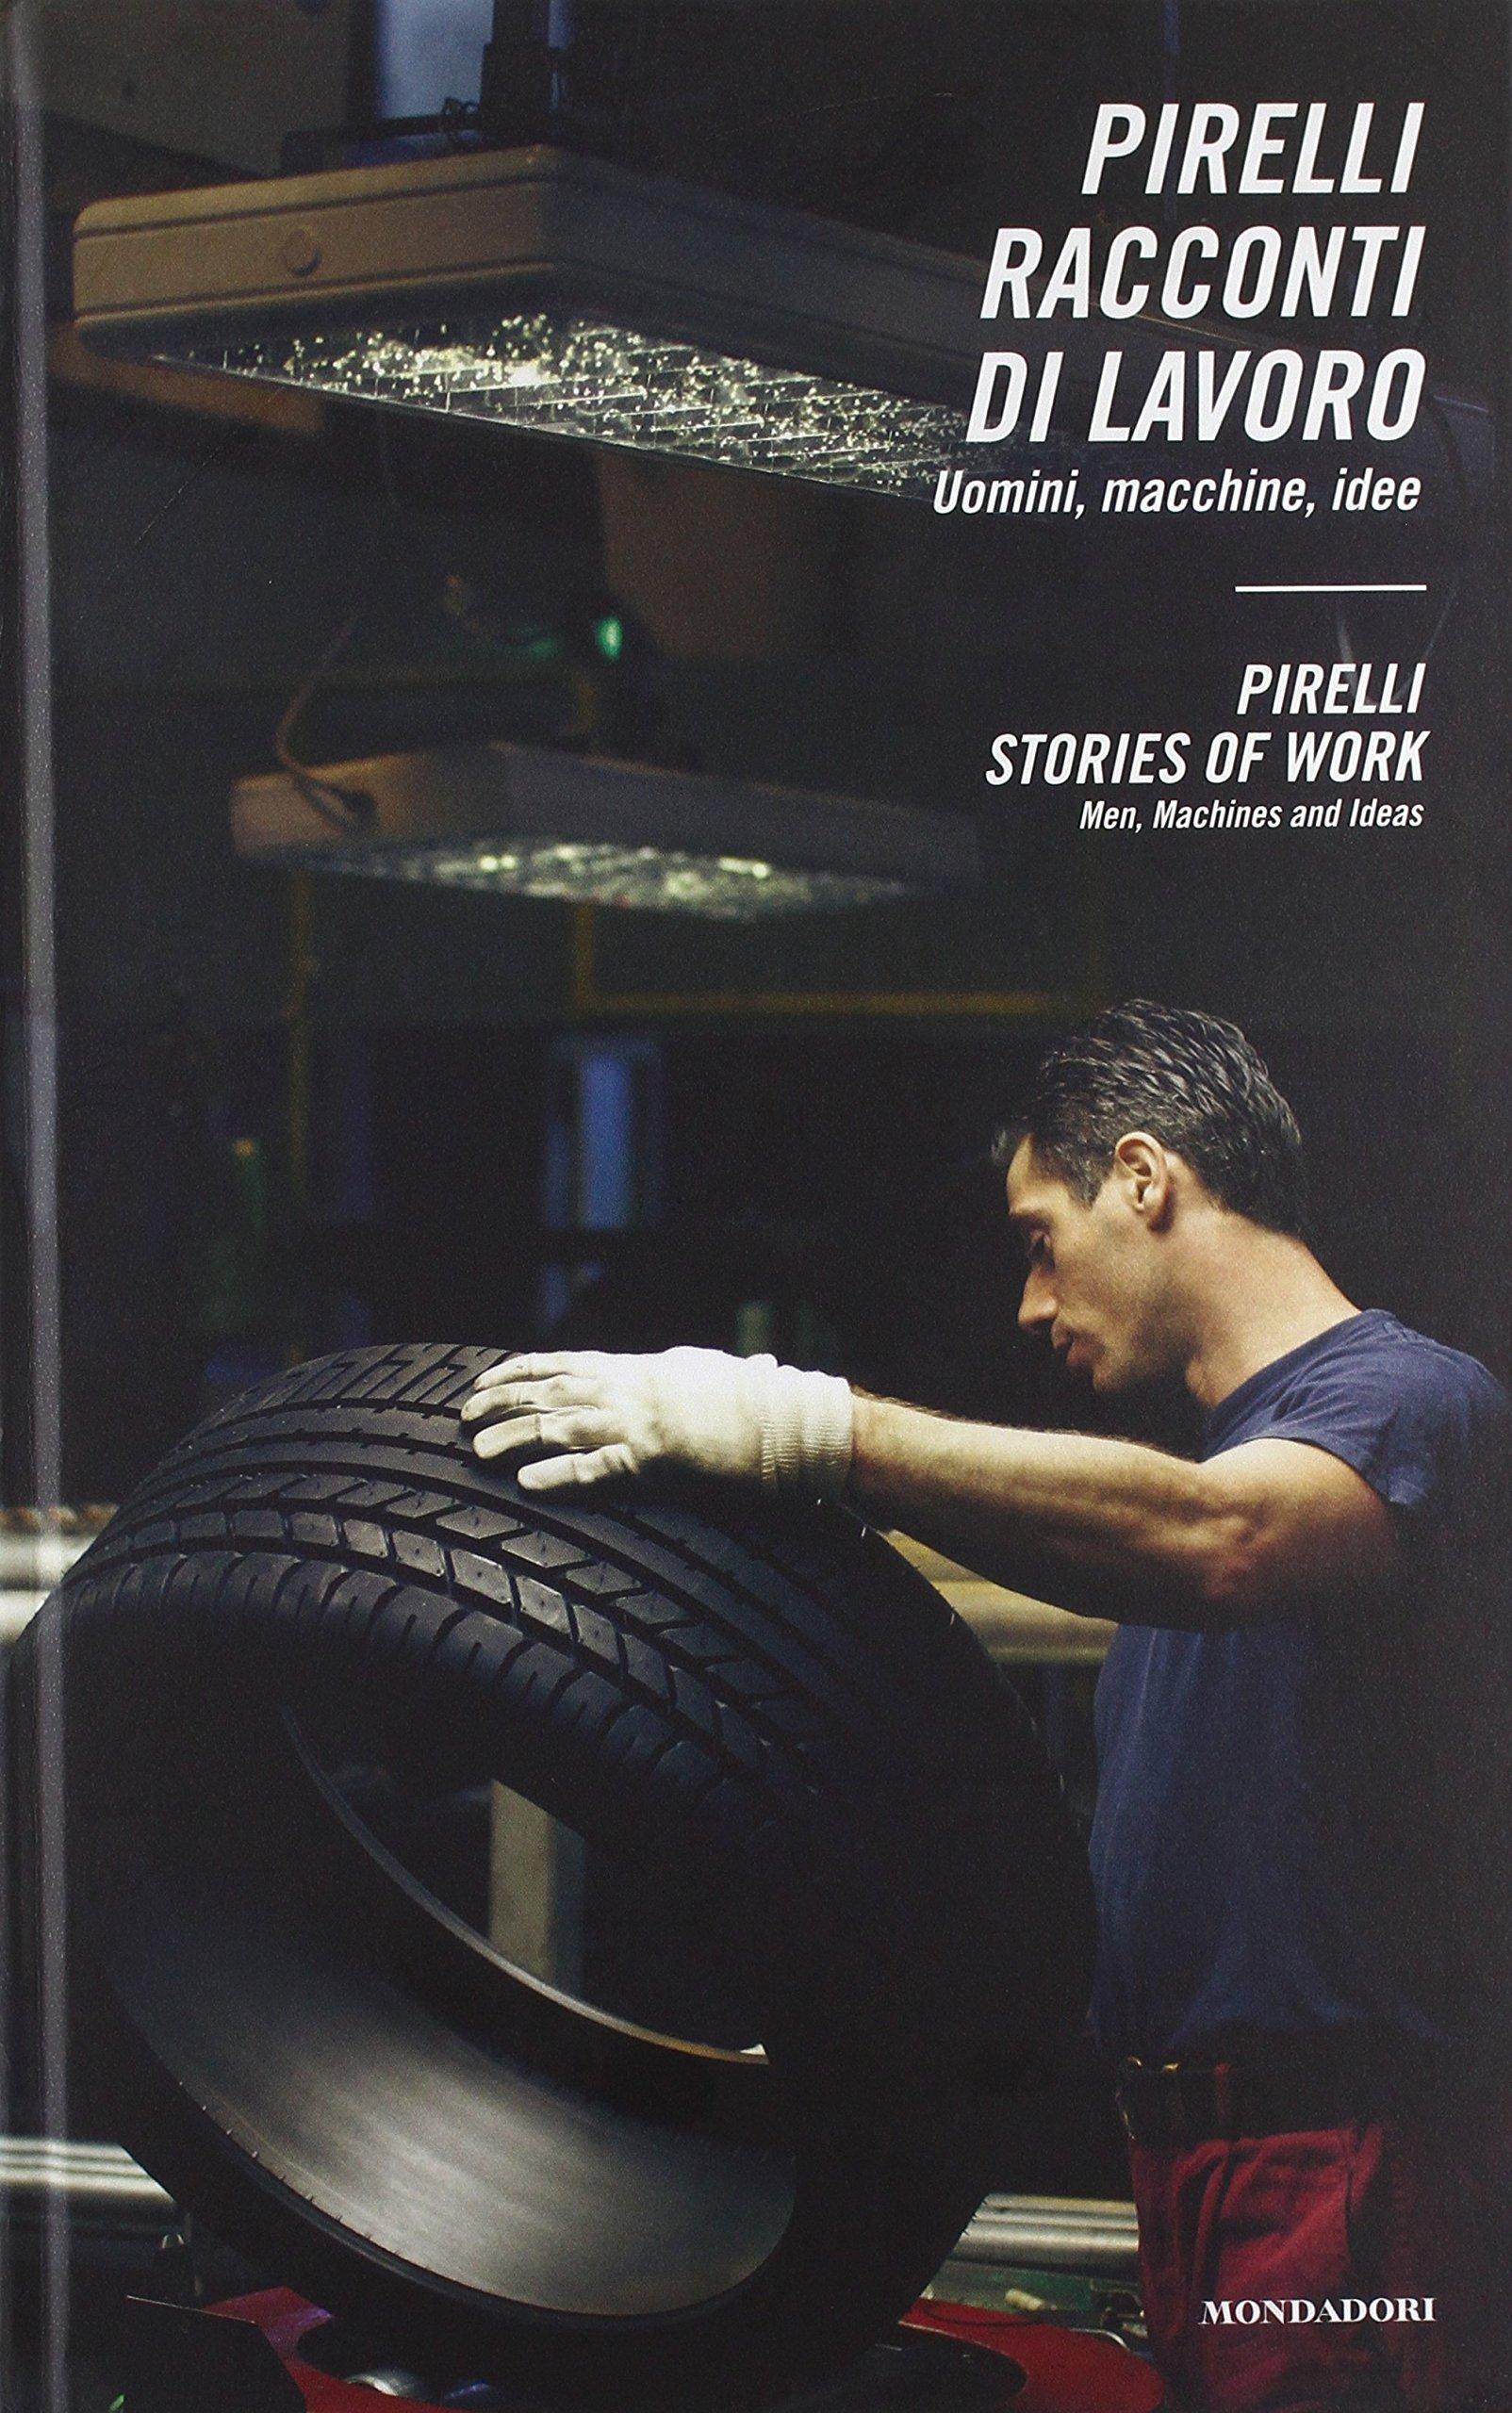 Pirelli. Racconti di lavoro. Uomini, macchine, idee-Pirelli. Stories of work. Men, machines and ideas. Ediz. bilingue (Inglese) Copertina rigida – 21 apr 2009 D. Pirola A. Victor S. A. White Mondadori Electa